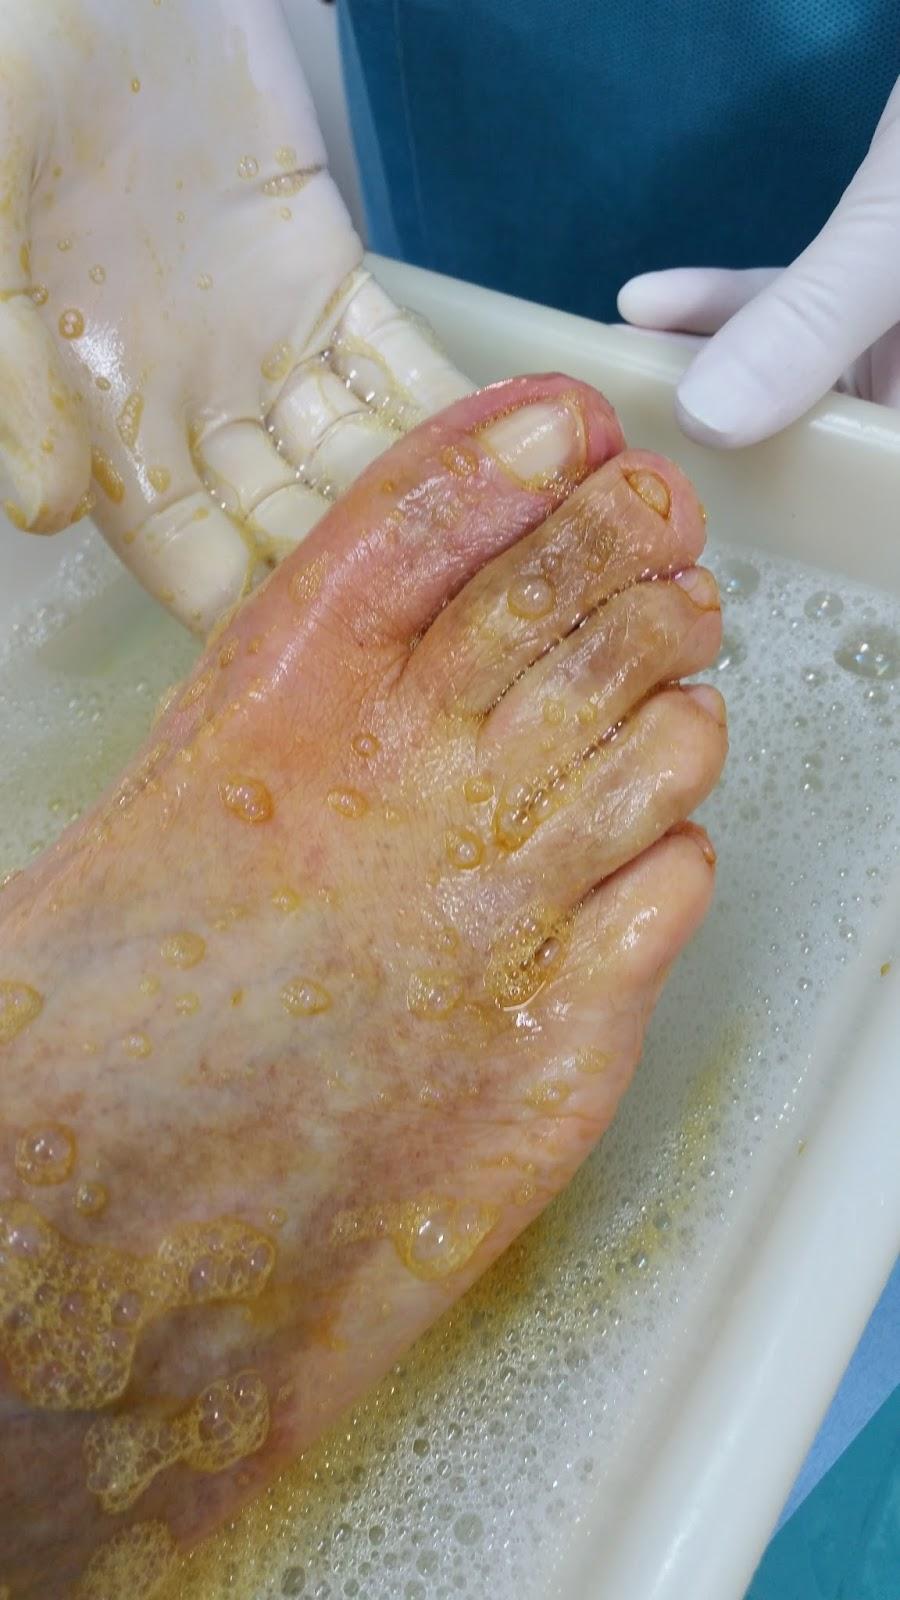 Podo basas al d a u a incarnada onicocriptosis t cnica for Operacion de pies